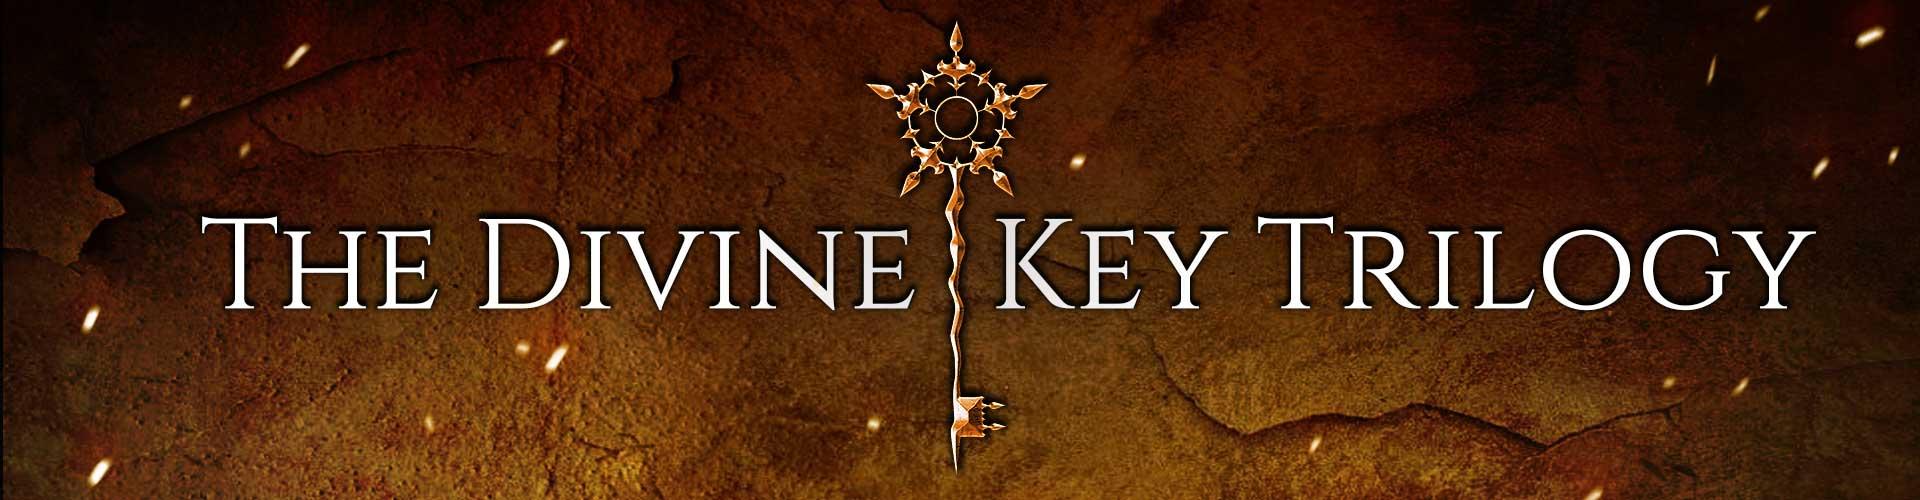 The-Divine-Key-Trilogy-Banner1-1920×500